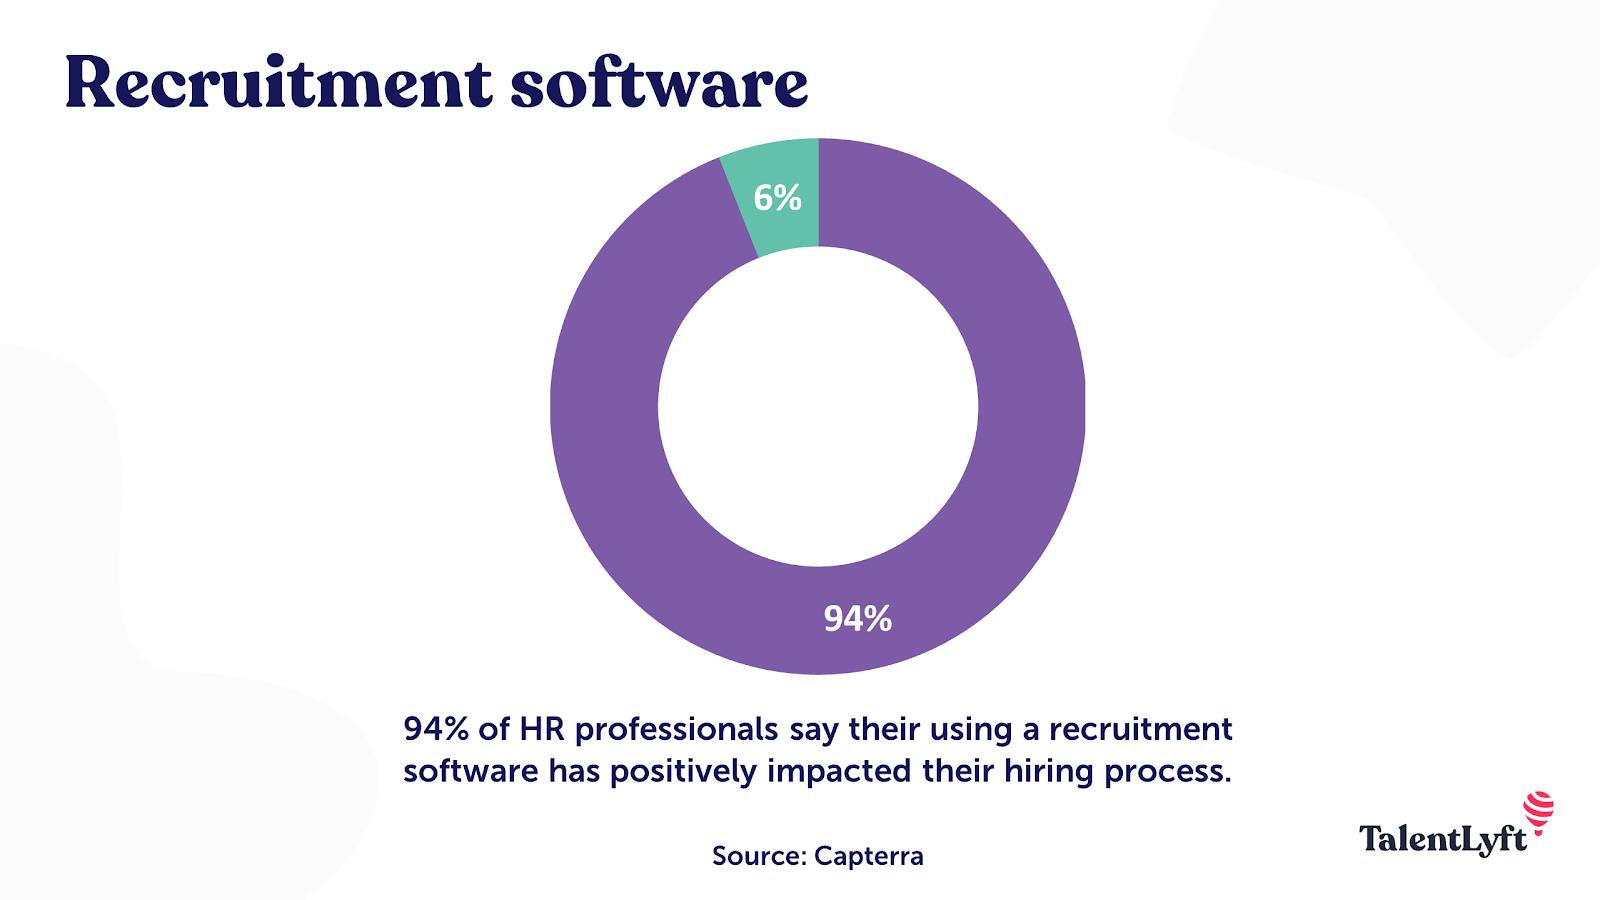 Benefits of using a recruitment software